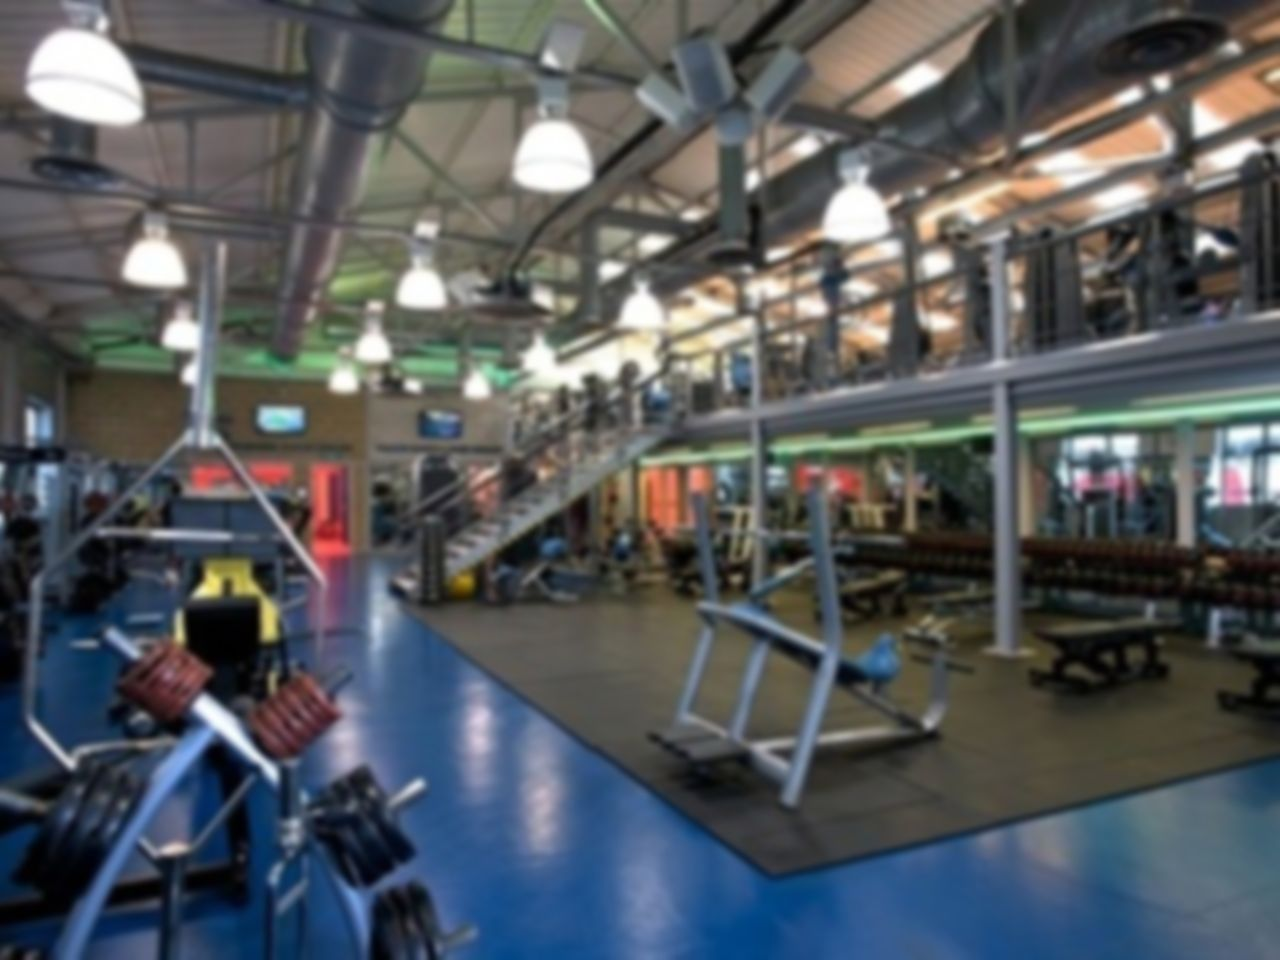 Soho gyms